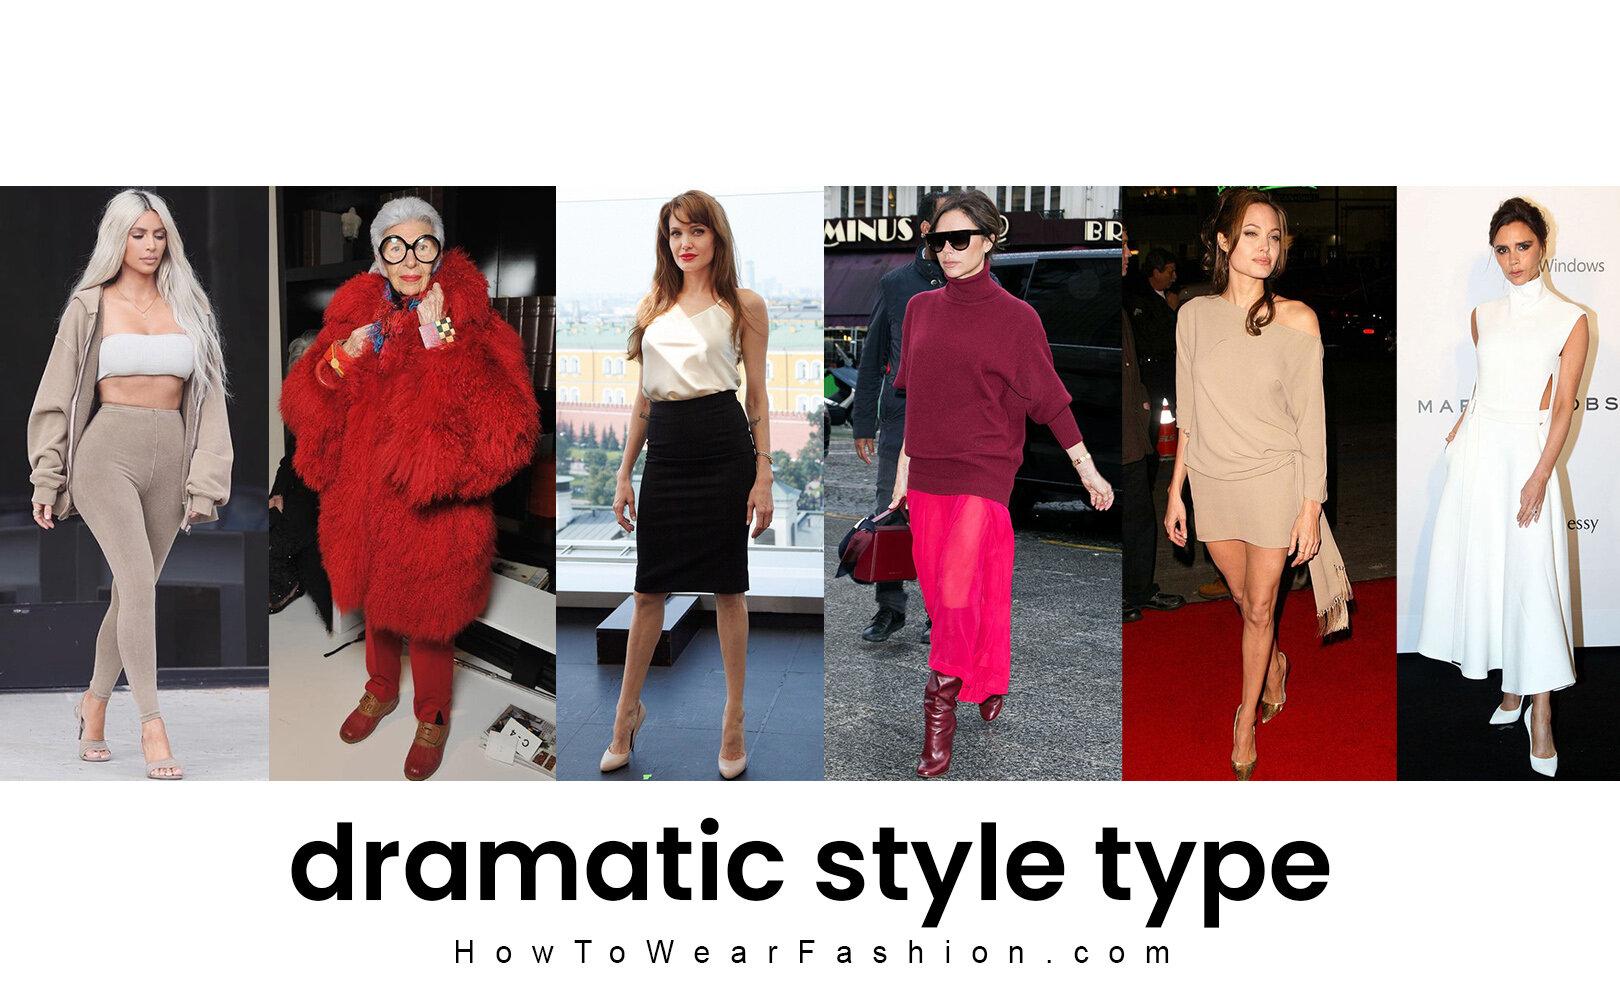 Dramatic Style Type Howtowear Fashion